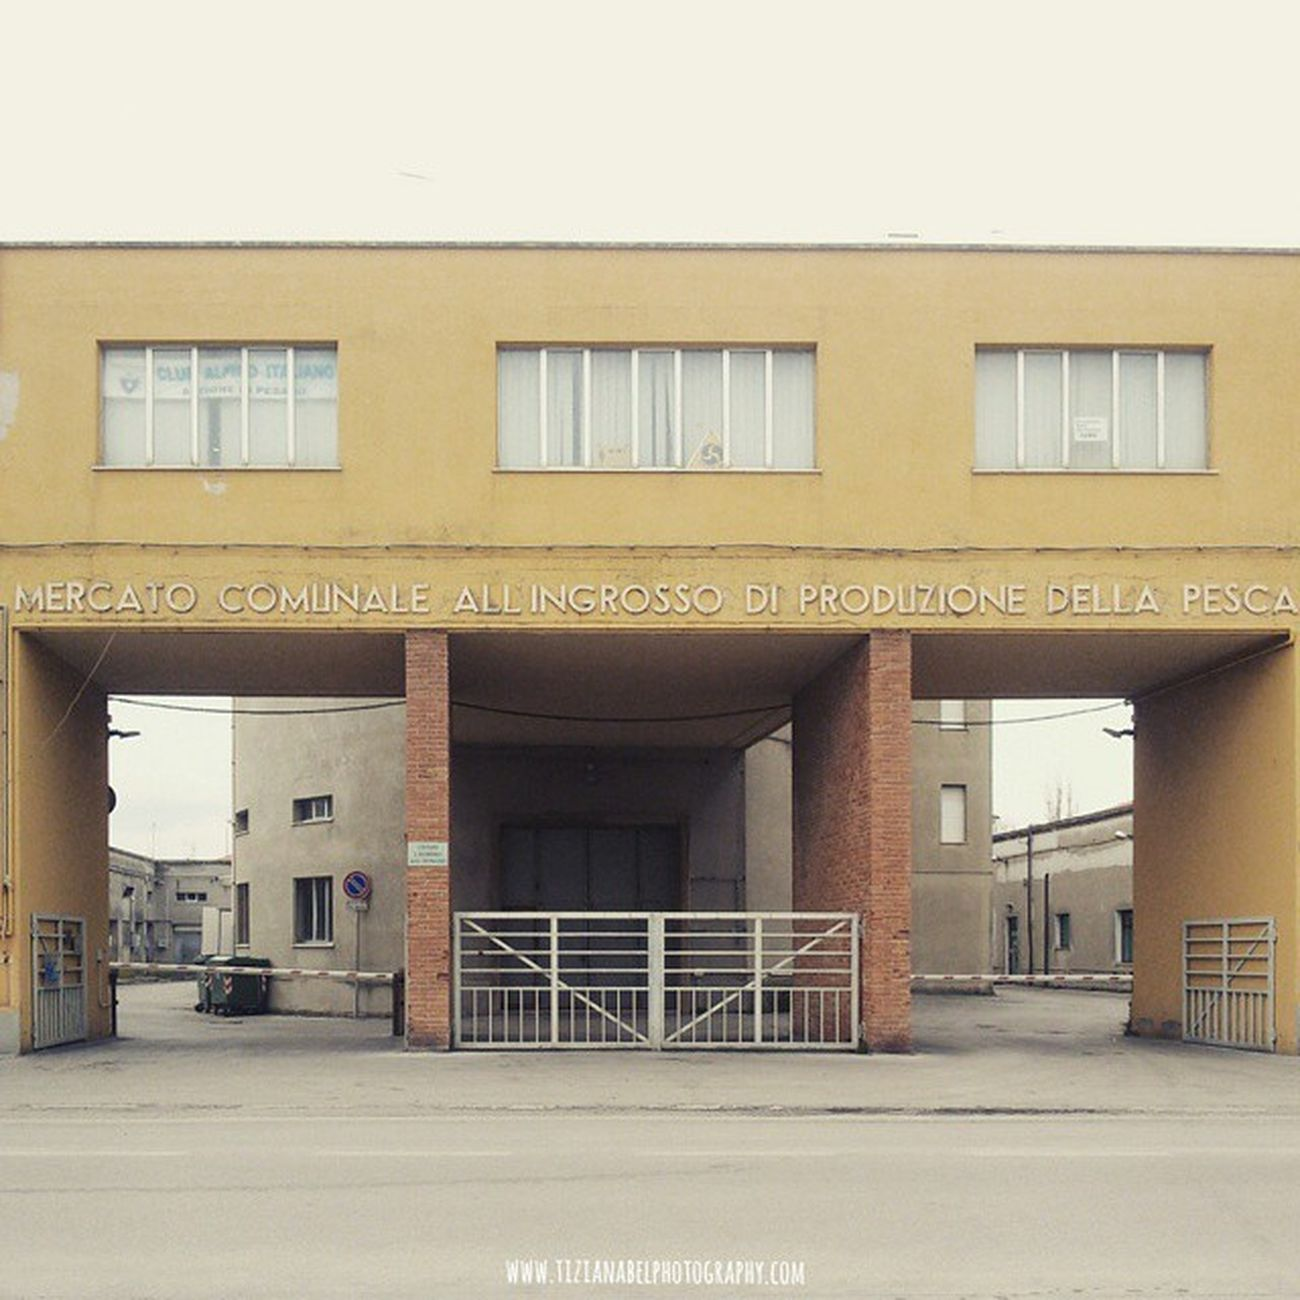 Fano www.tizianabelphotography.com Fano Marche Visitmarche Italy Visititaly Archilovers Architecturelovers Architecture City Street Streetstyle Urban Streetstyle Explore Travel Space Mercato Pesca Color Crema Tagsforlikes Like Like4like Morning Ignt_concretejungle